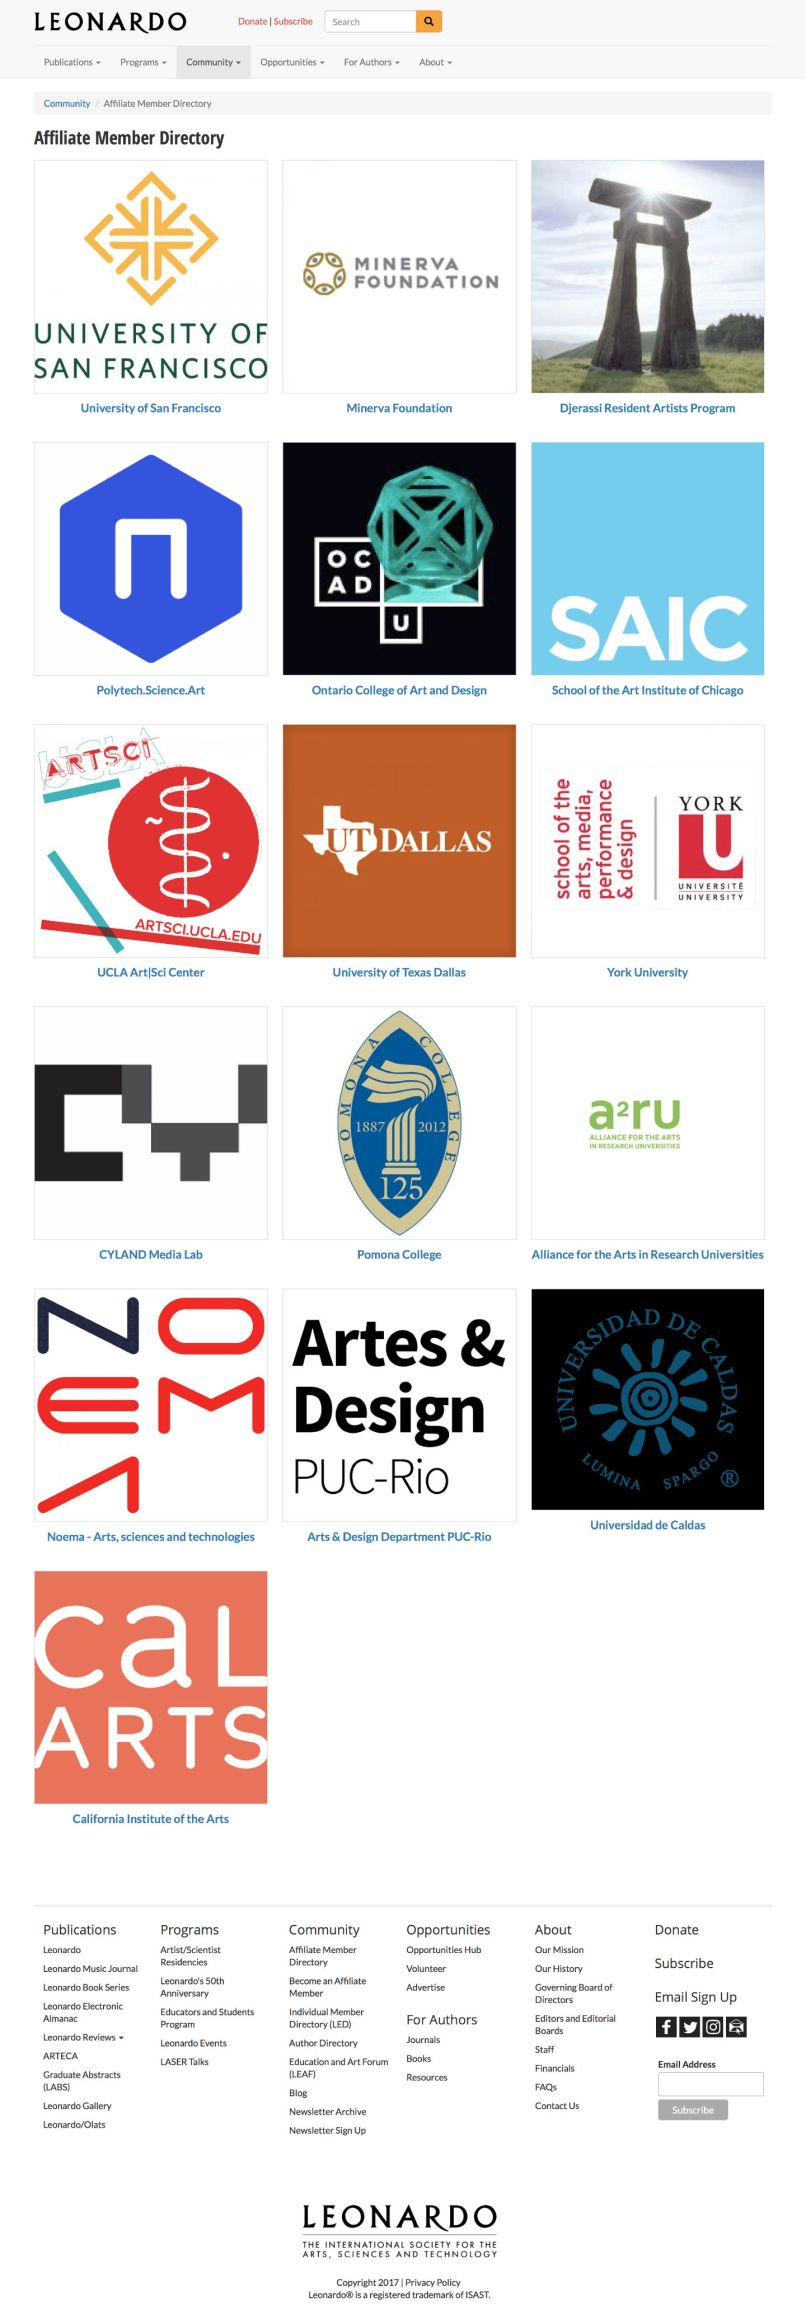 Affiliate Member Directory | Leonardo/ISAST